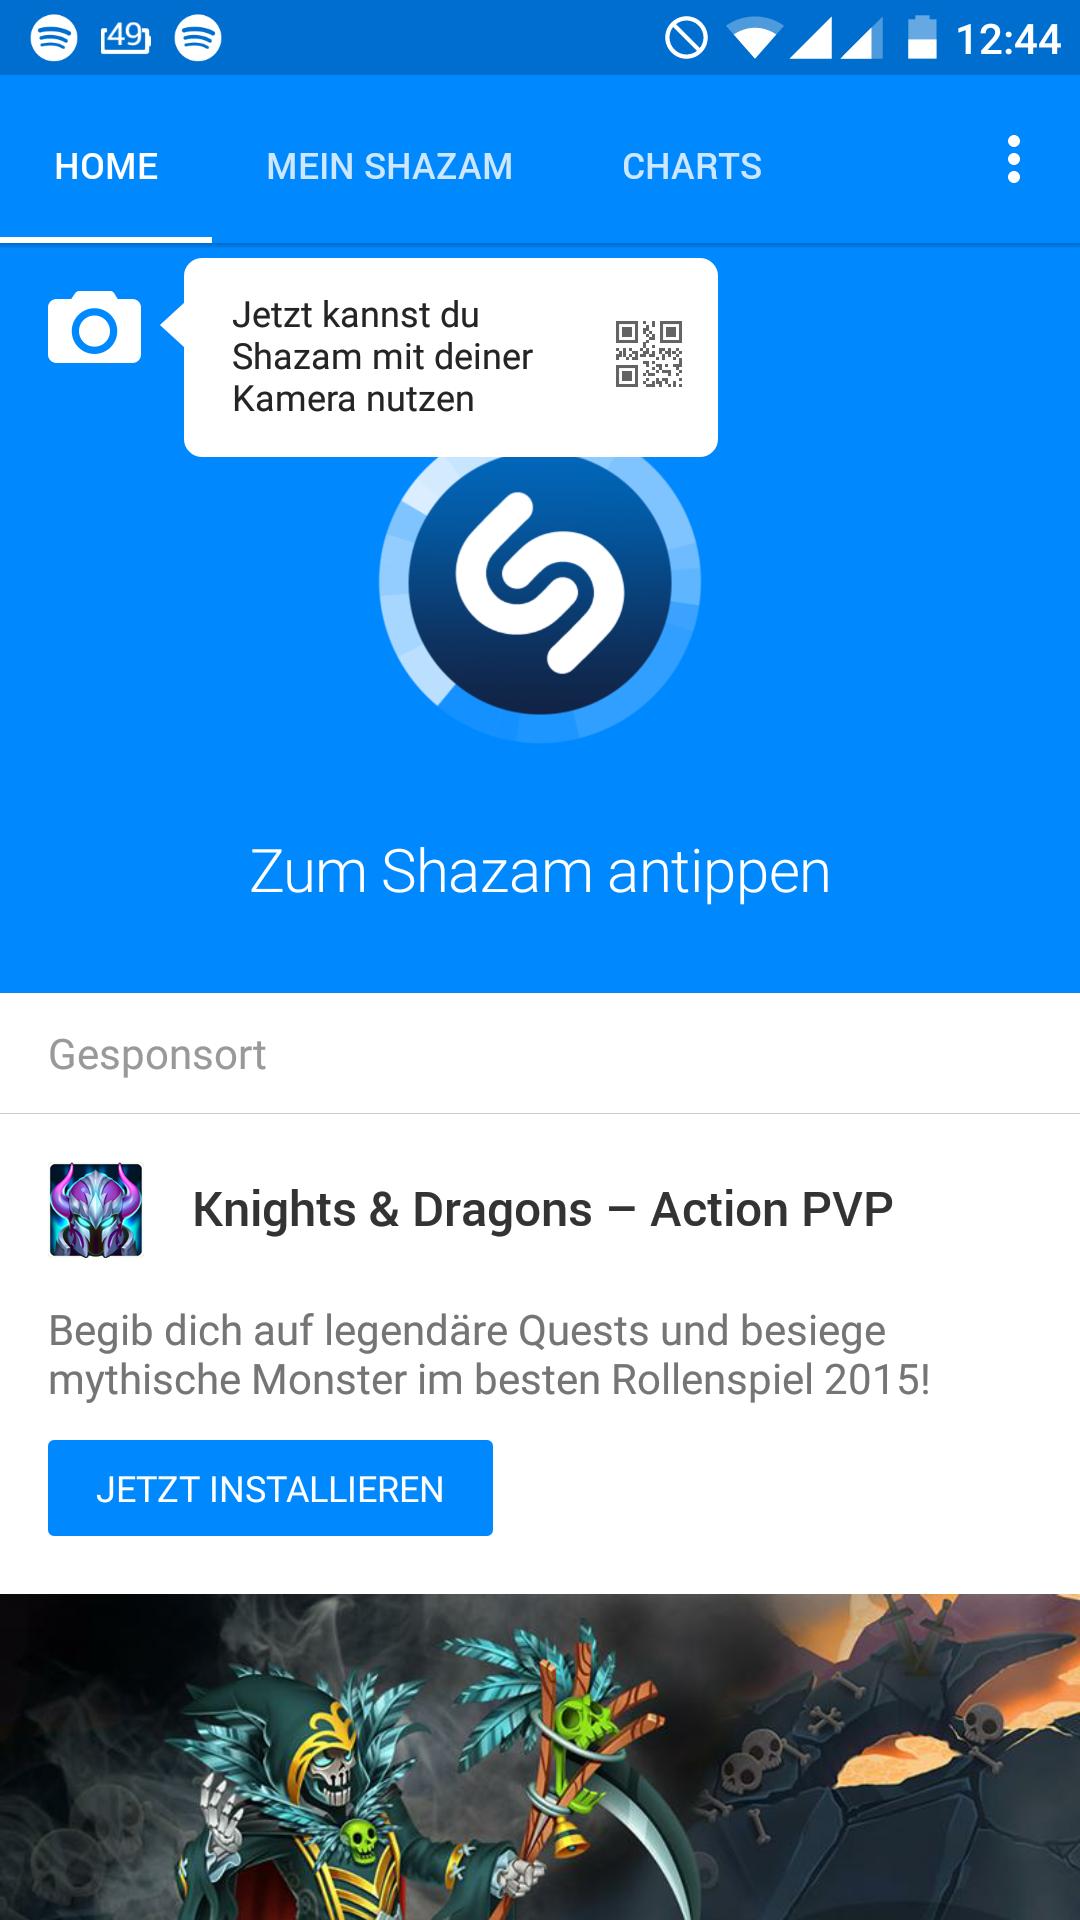 Screenshot_2015-11-13-12-44-44.png